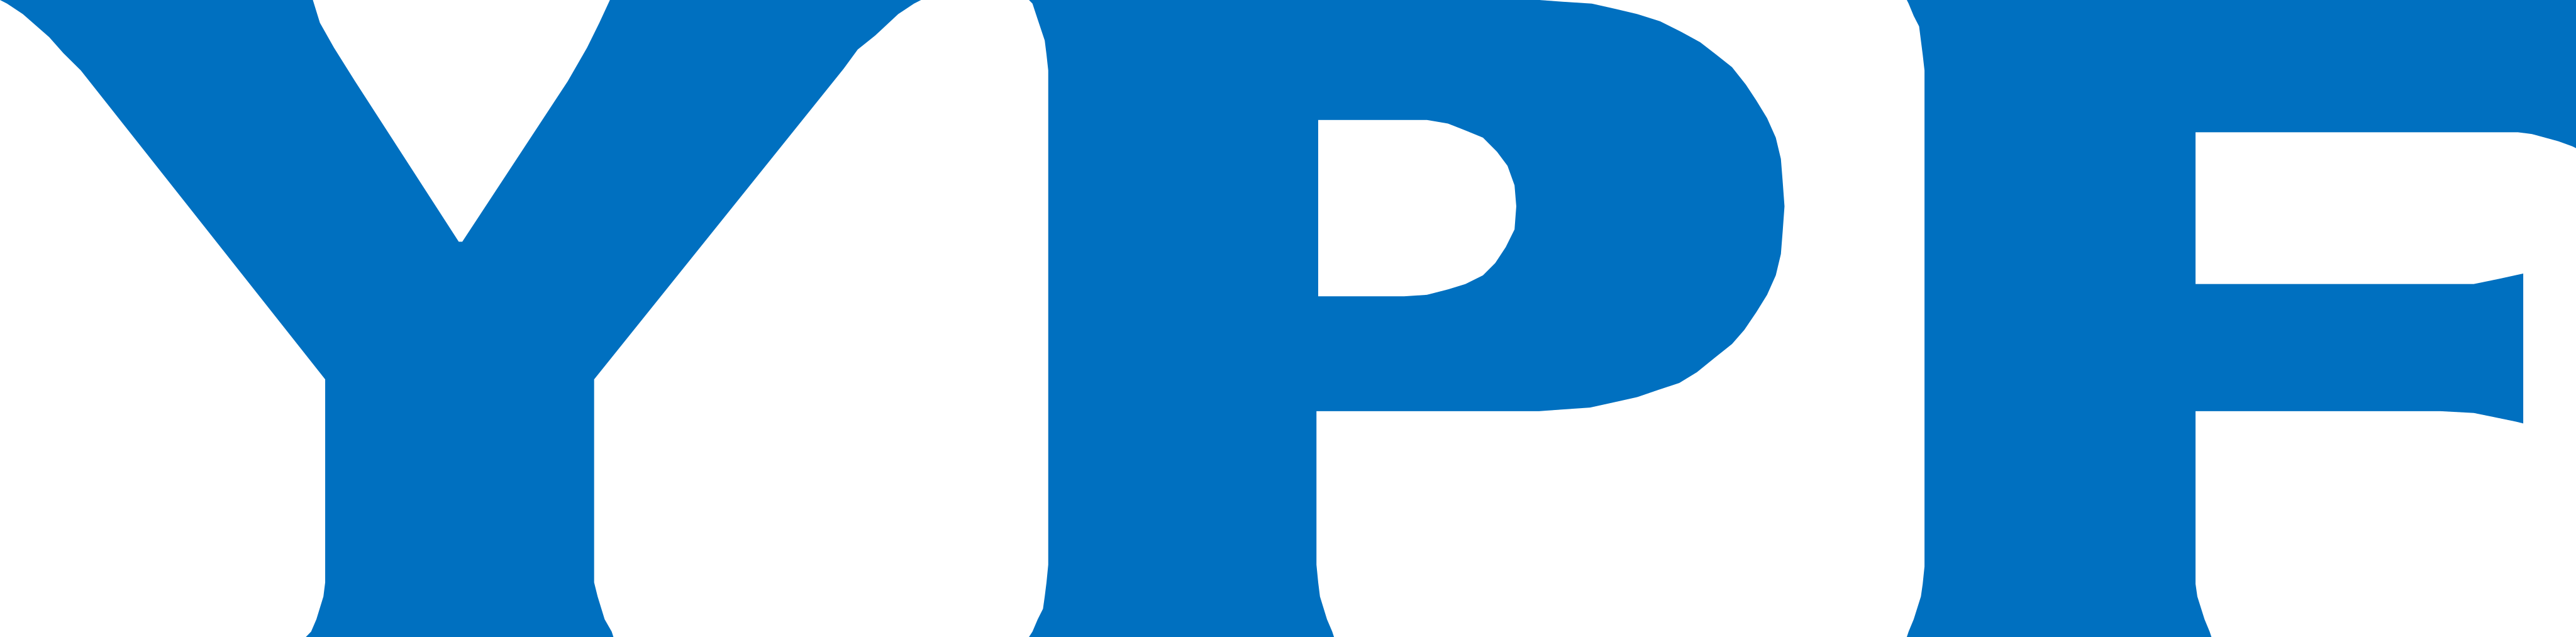 Logo ypf